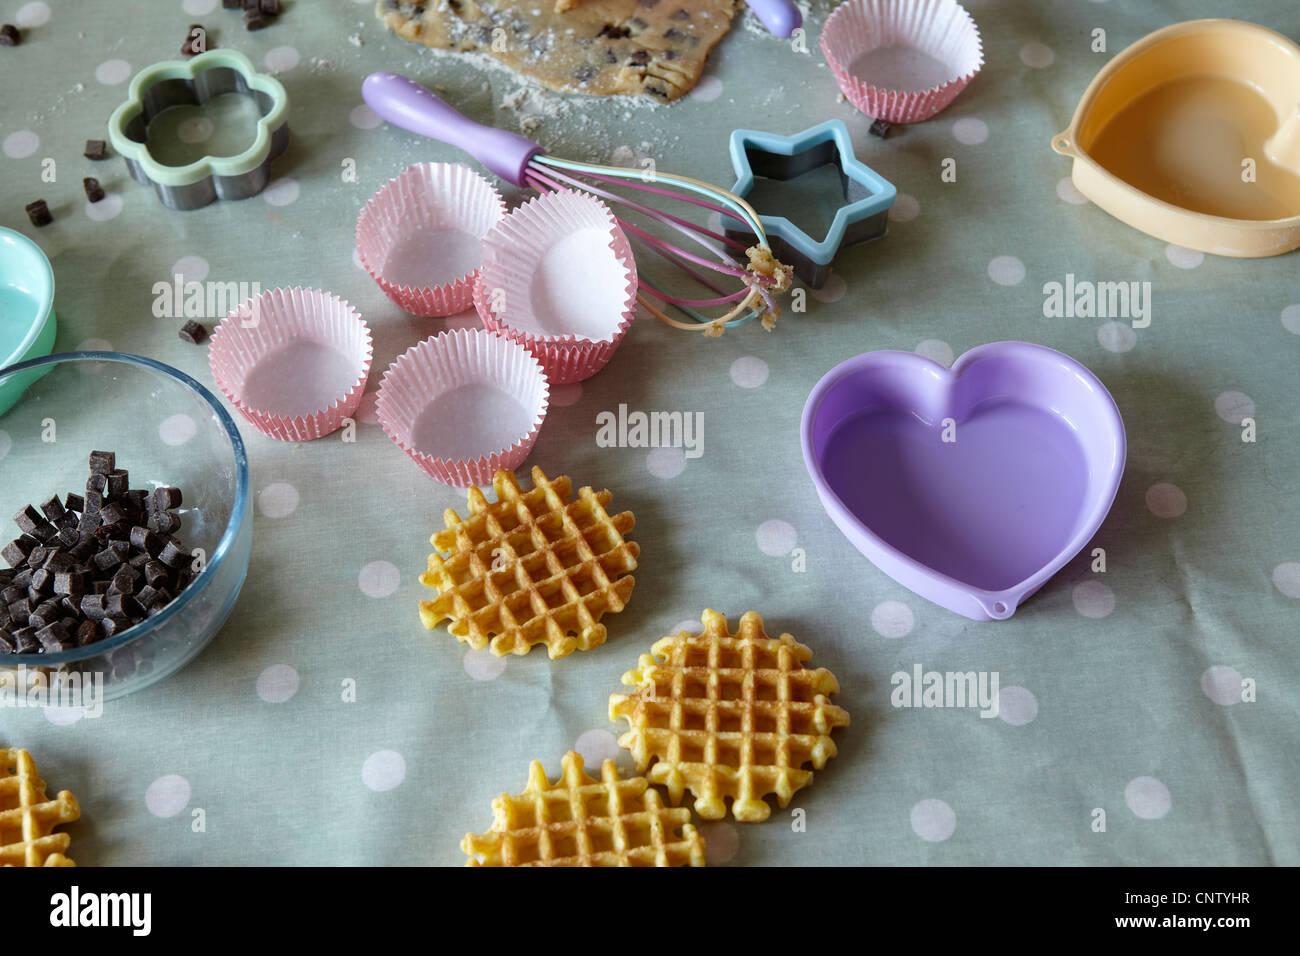 Implementiert in messy Küche Backen Stockfoto